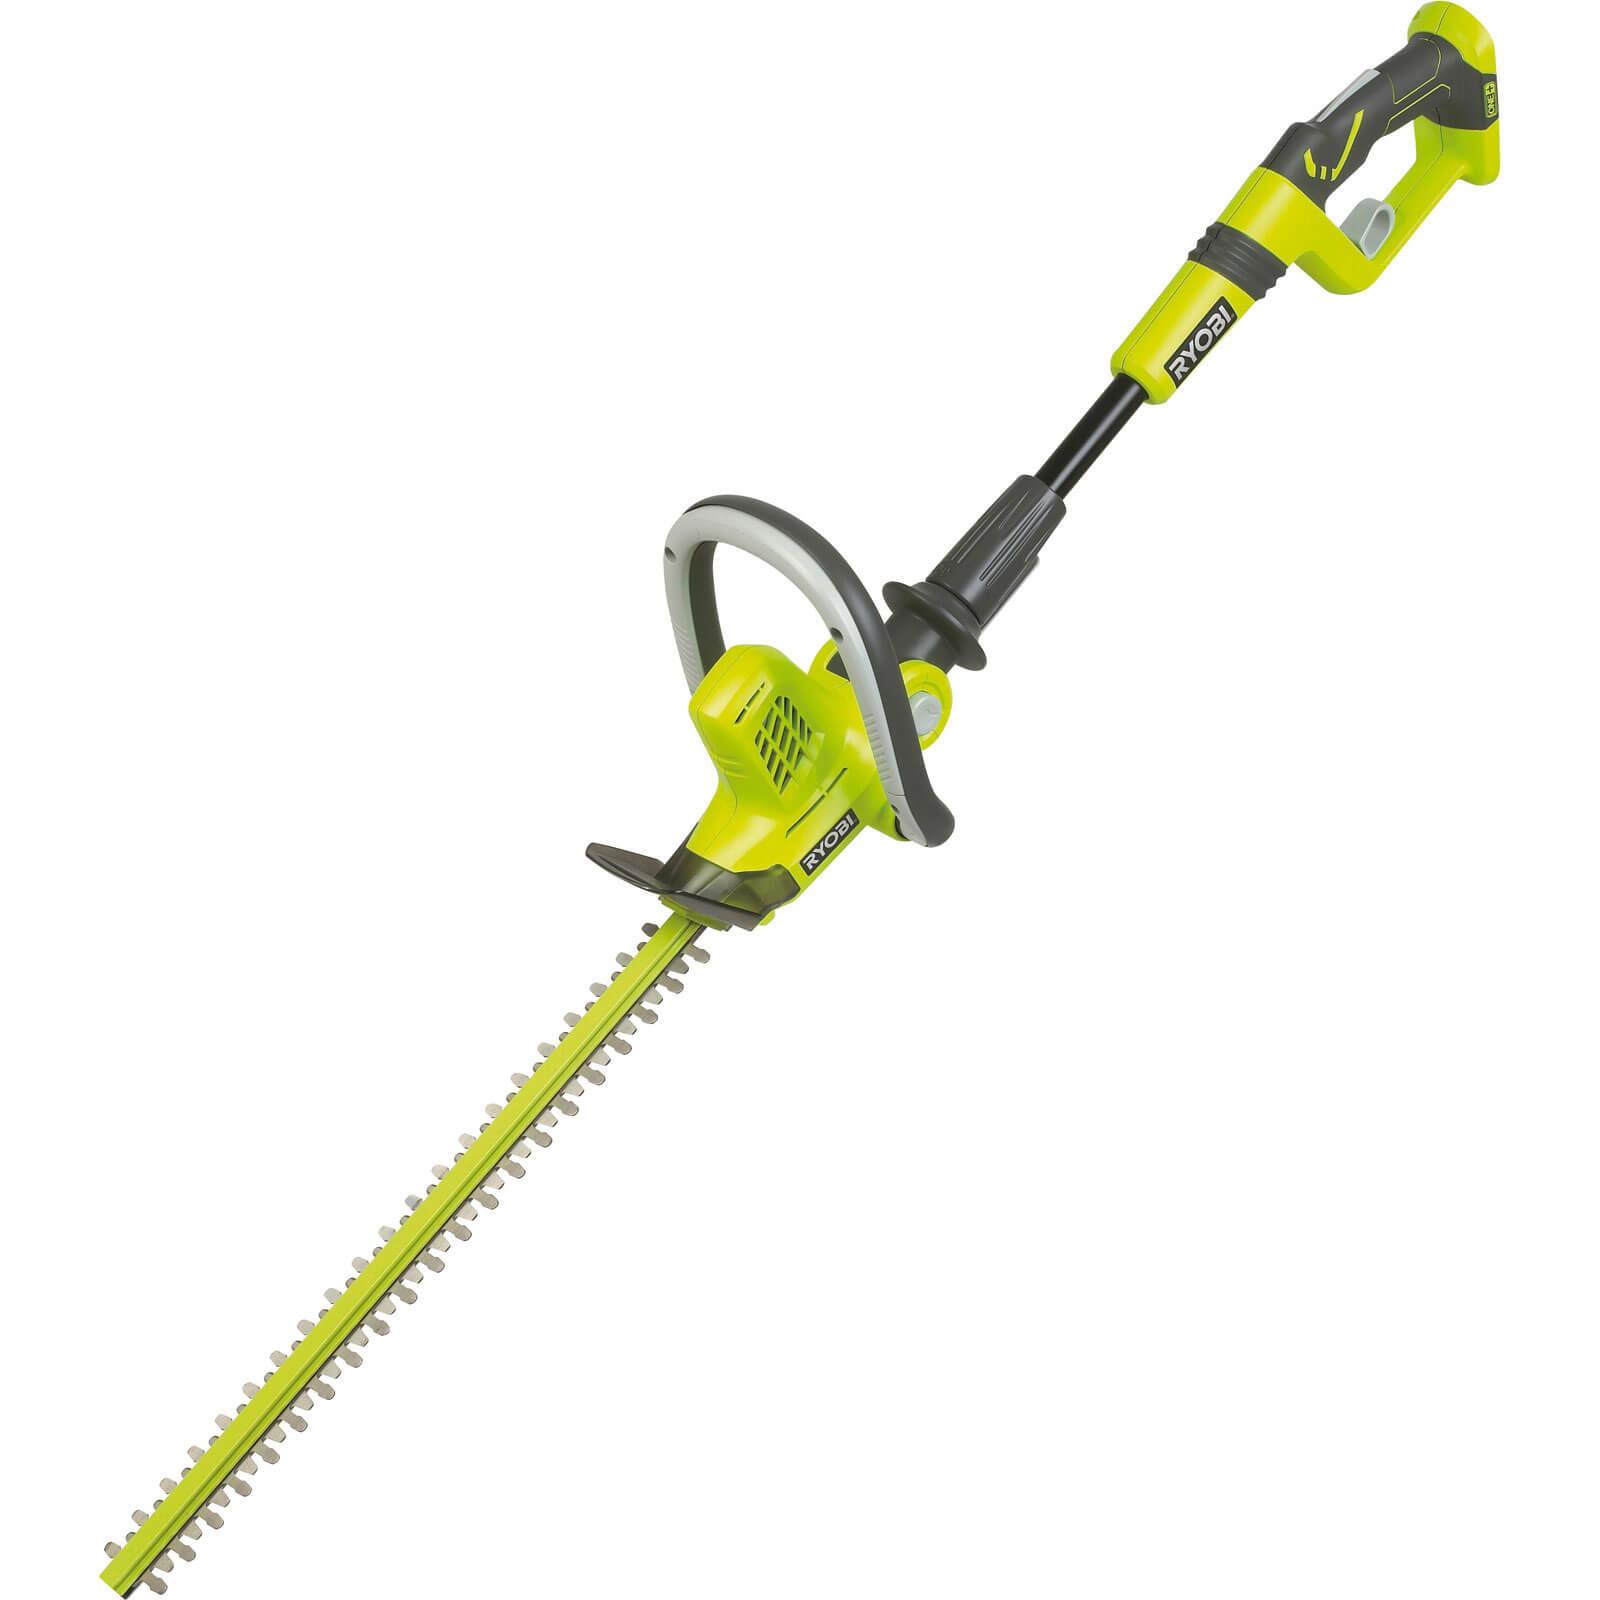 Ryobi OHT1850X 18v Cordless Long Reach Hedge Trimmer 500mm No Batteries No Charger